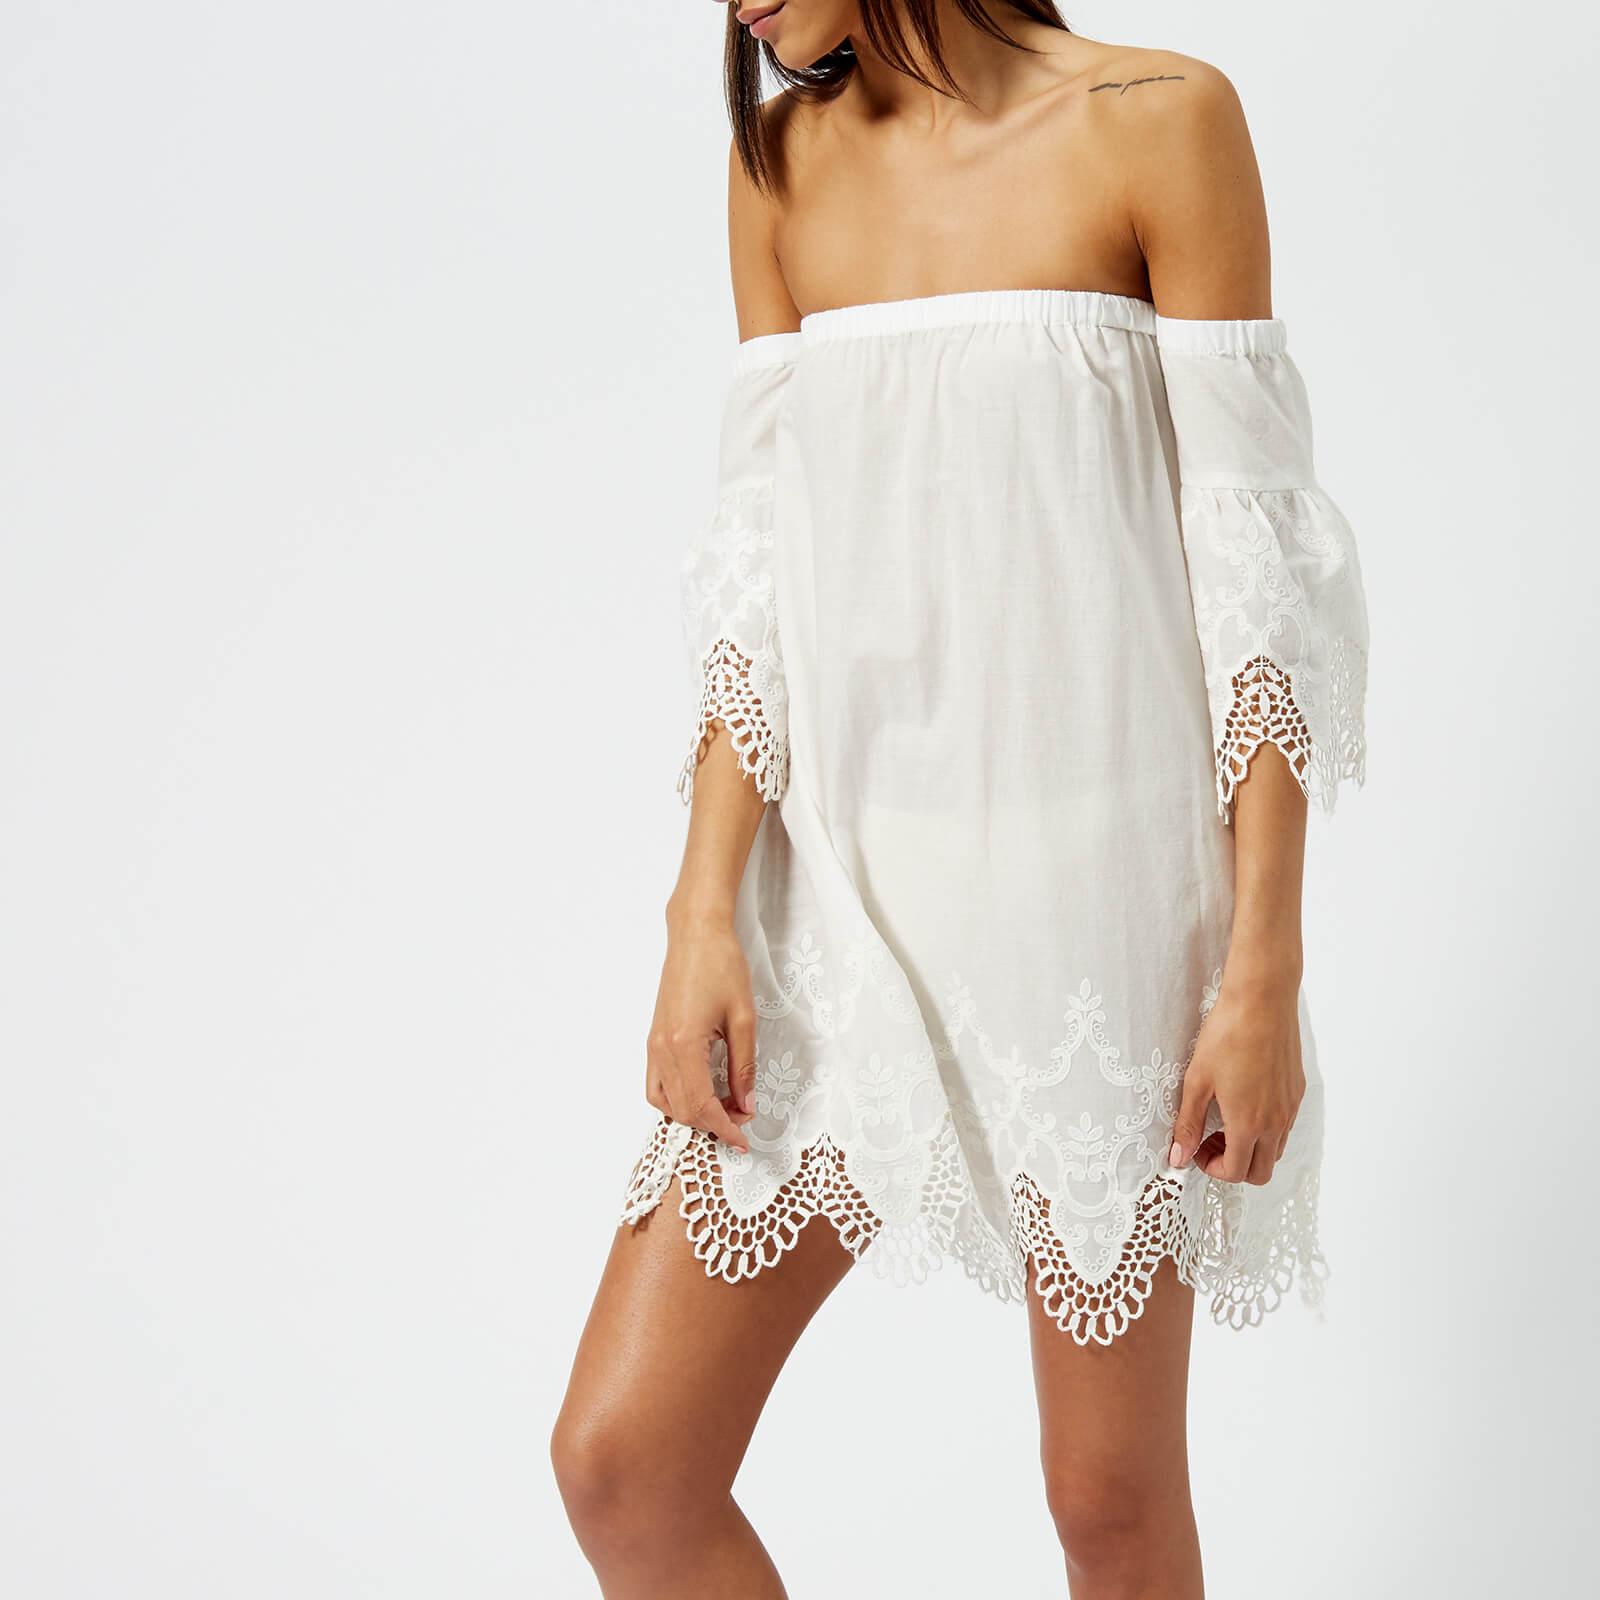 e363d4f814e MINKPINK Women's Charlotte Broderie Off the Shoulder Dress - White Womens  Clothing | TheHut.com